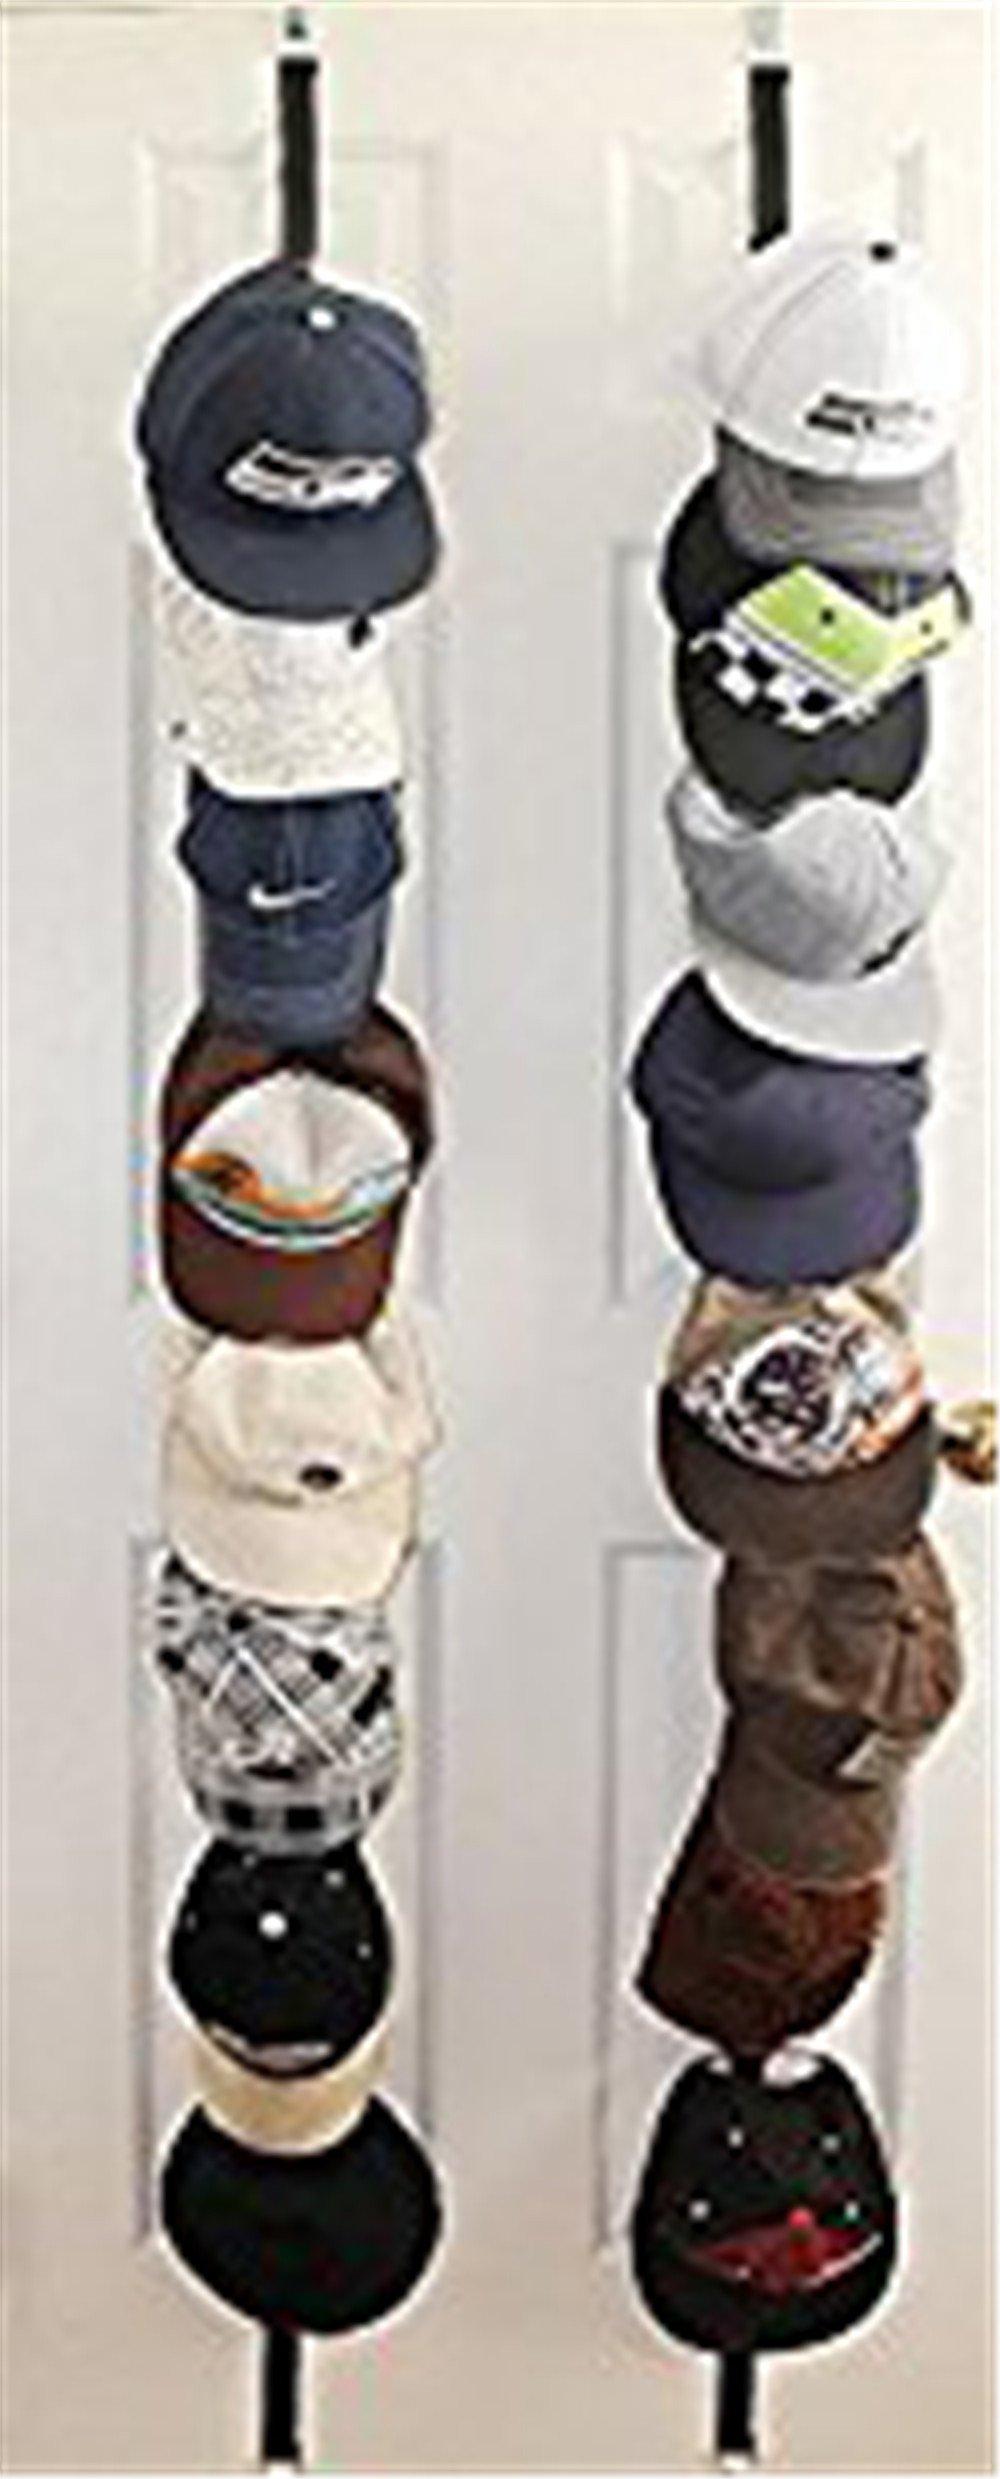 ZARO Hat Holder for Door, Adjustable Bag Hanger for Closet Cap Rack Baseball Hat Storage Organizer Ball Caps Cord Shelf Bedroom Decoration for Guys Girls-2 Sets for Black